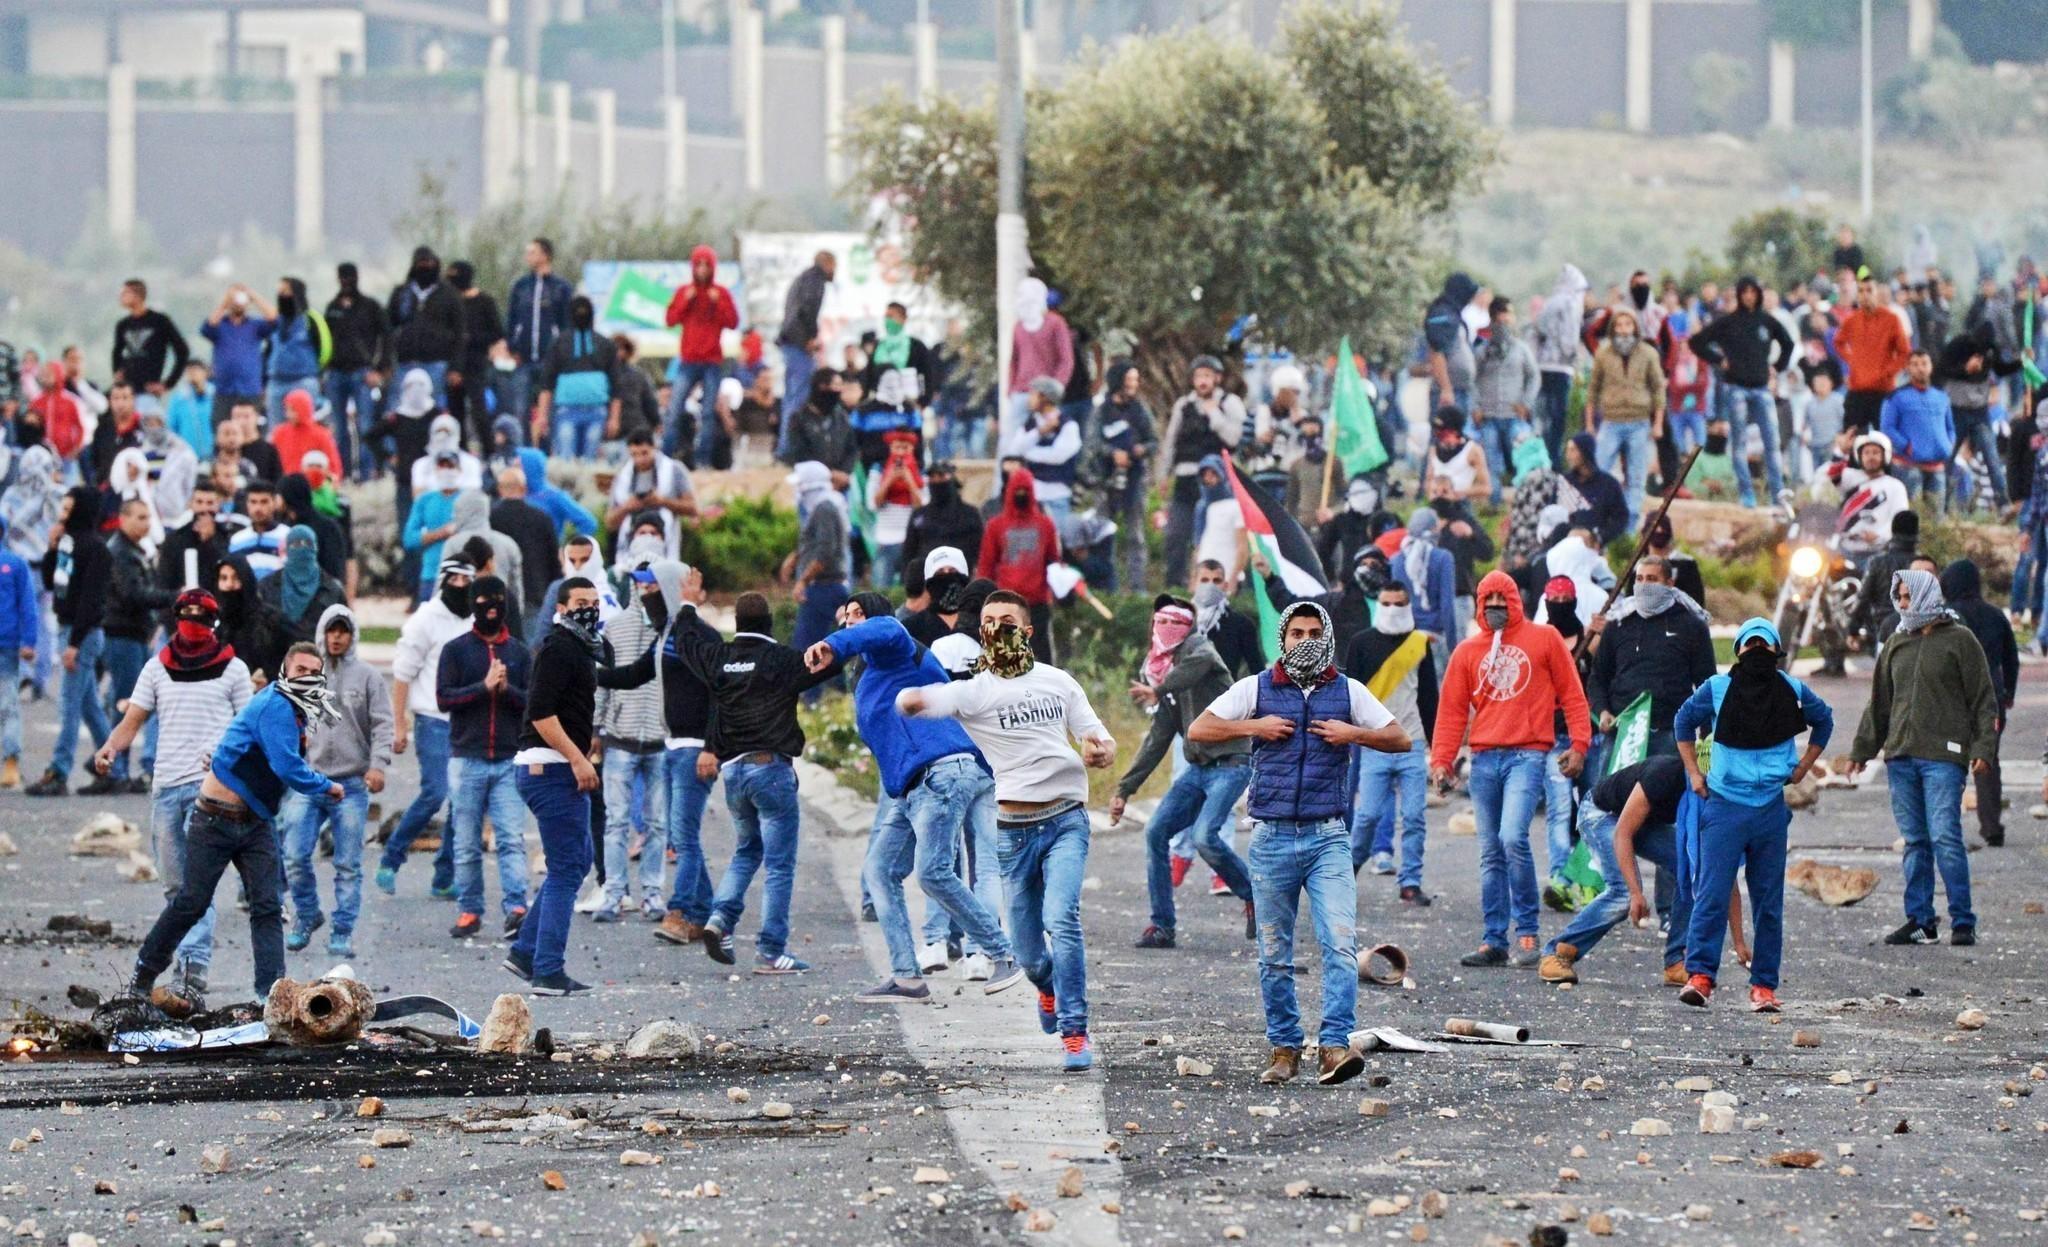 Fatal police shooting prompts strike by Israeli Arabs - LA ...